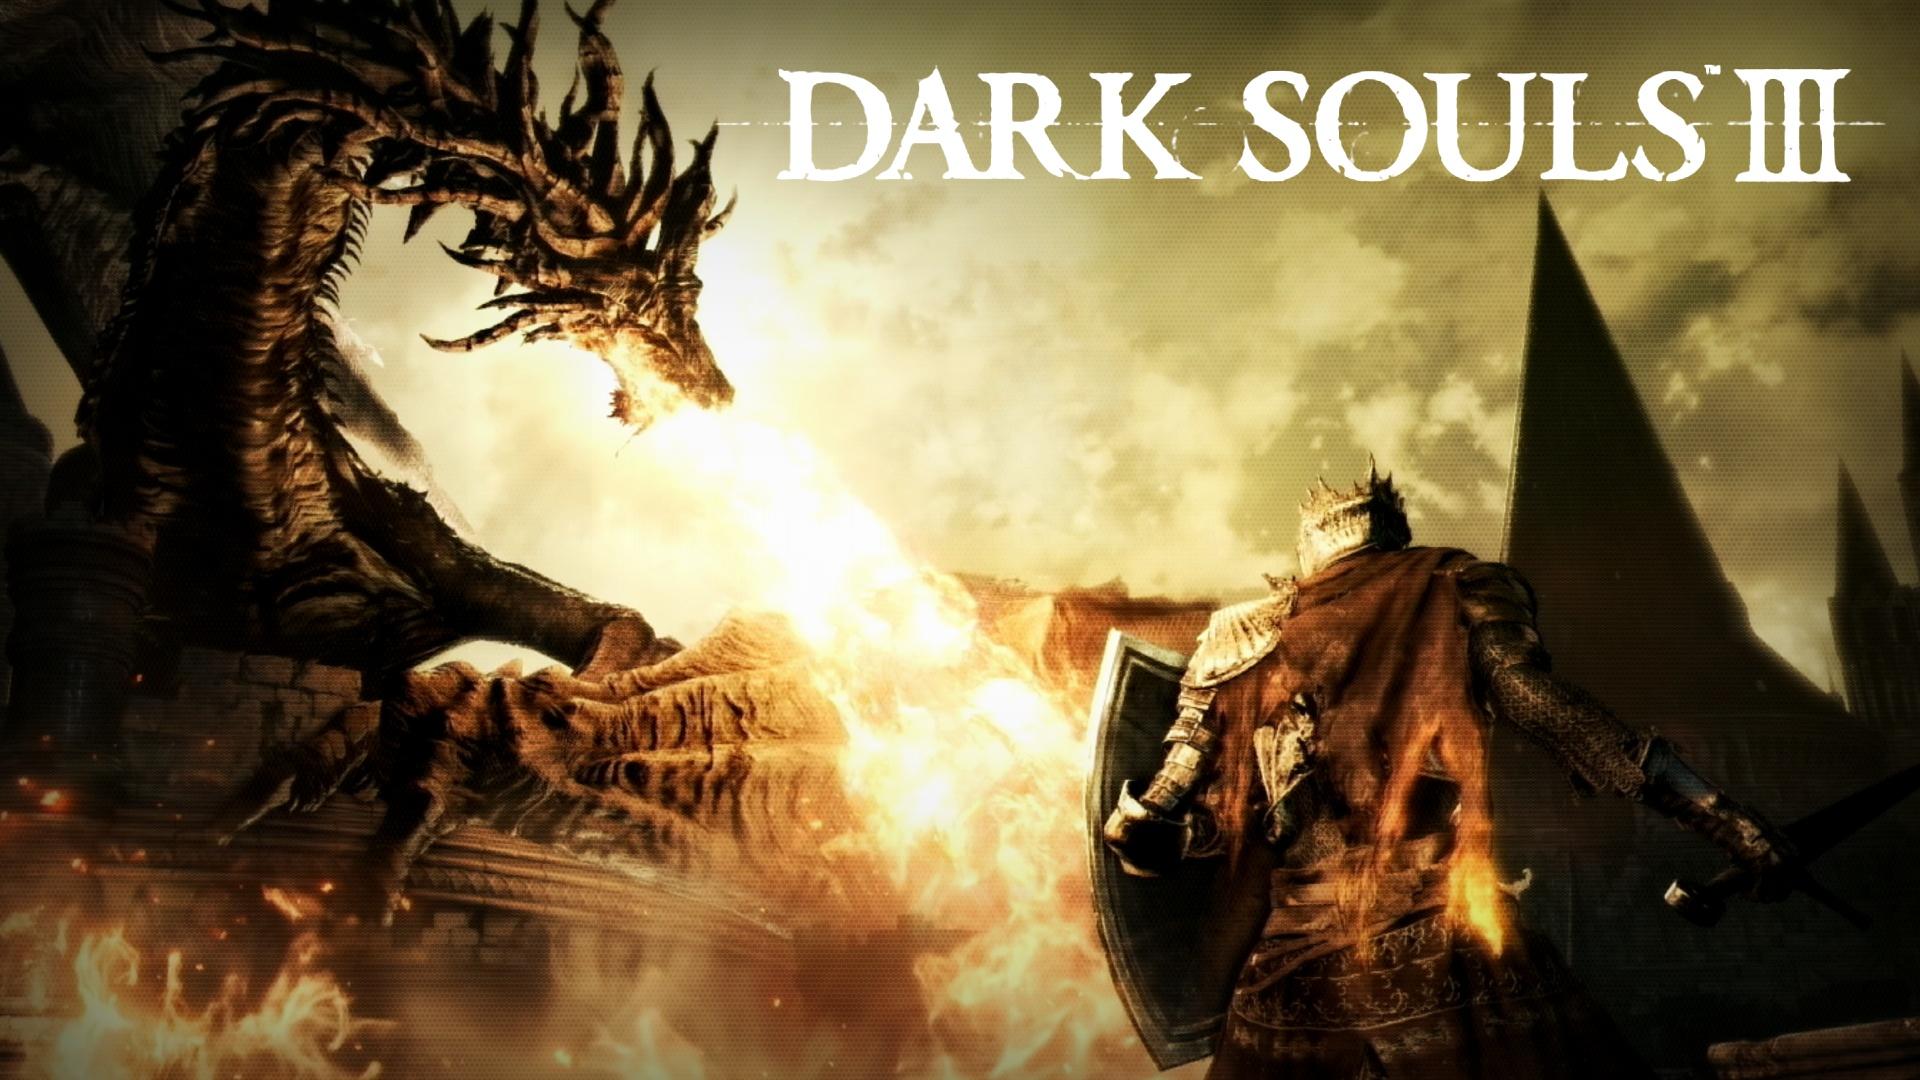 💌 Dark souls 3 full ost download | Dark Souls 3 Free Download  2019